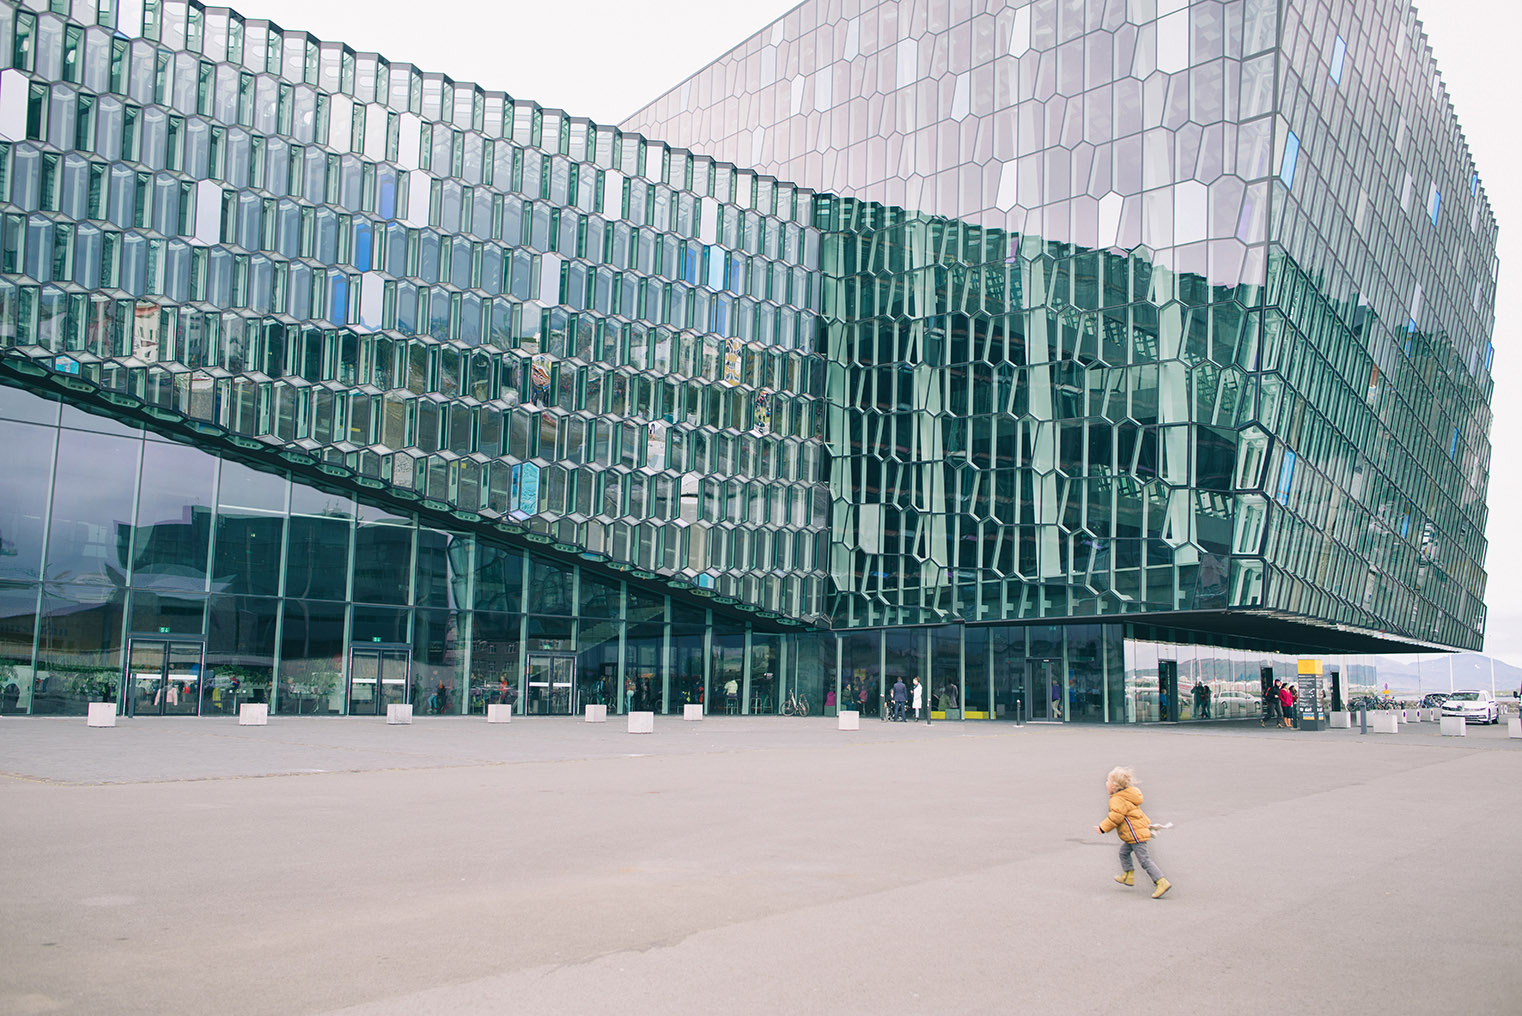 Reykjavik – Harpa